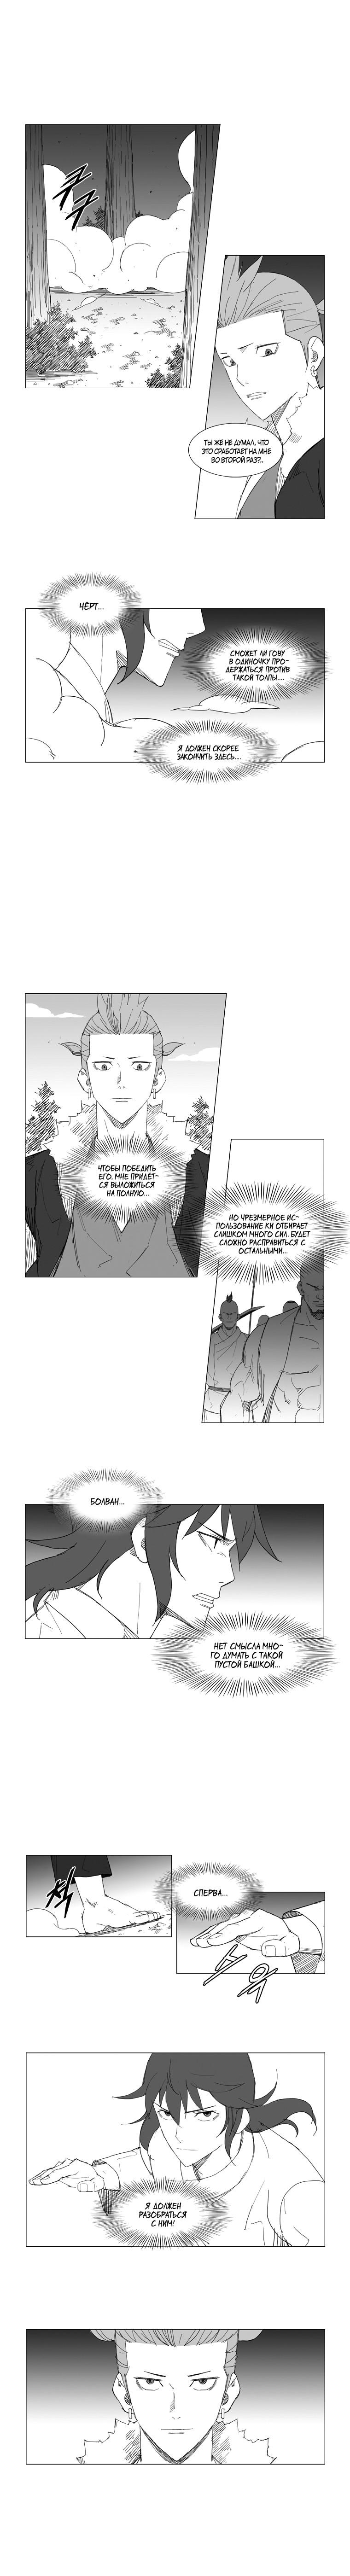 https://r1.ninemanga.com/comics/pic2/39/28263/330500/1501349336343.jpg Page 4